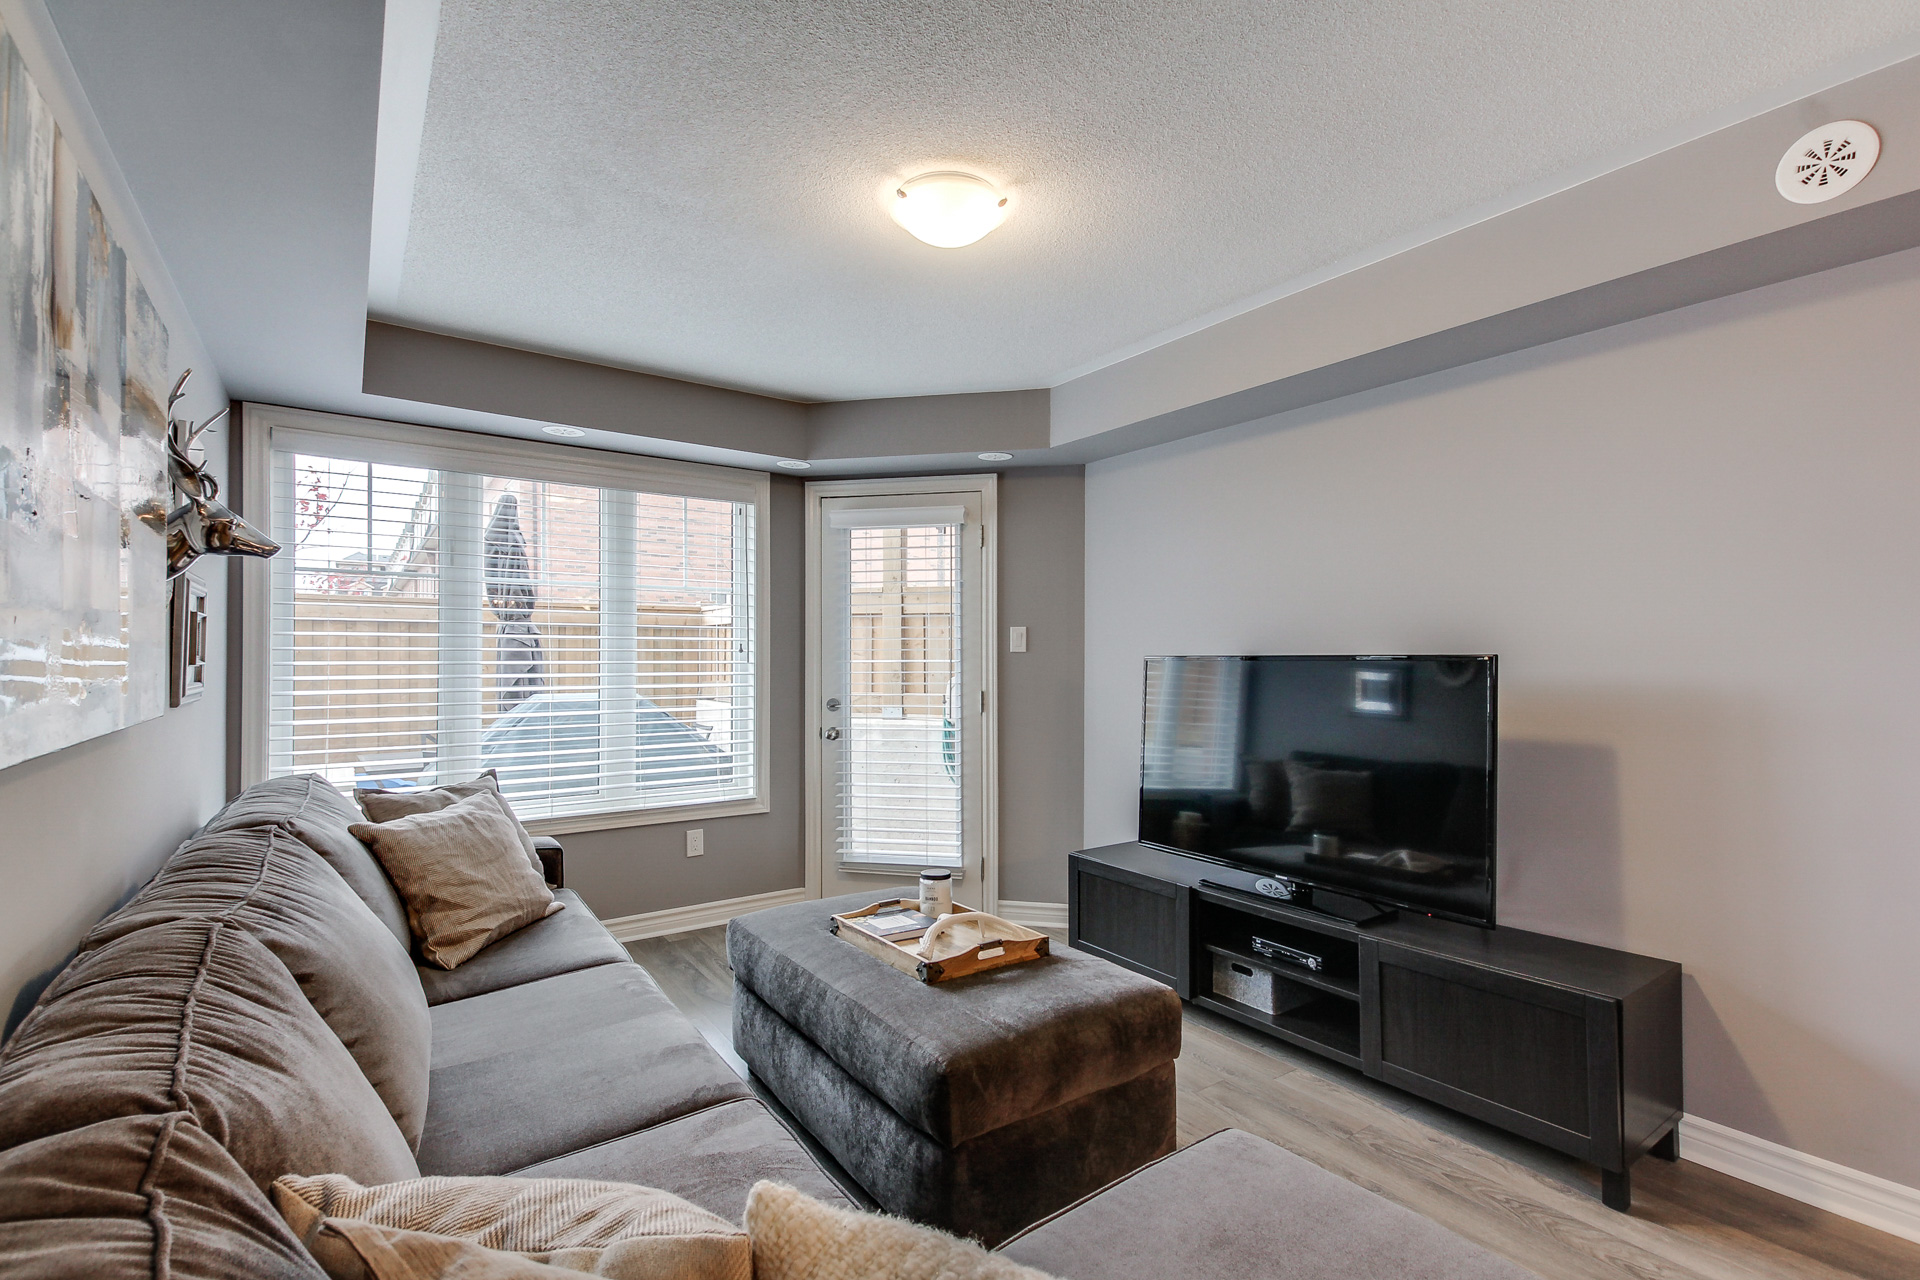 2420-Baronwood-Drive-2201-Oakville-For-Sale-Karly-Moore (7).jpg